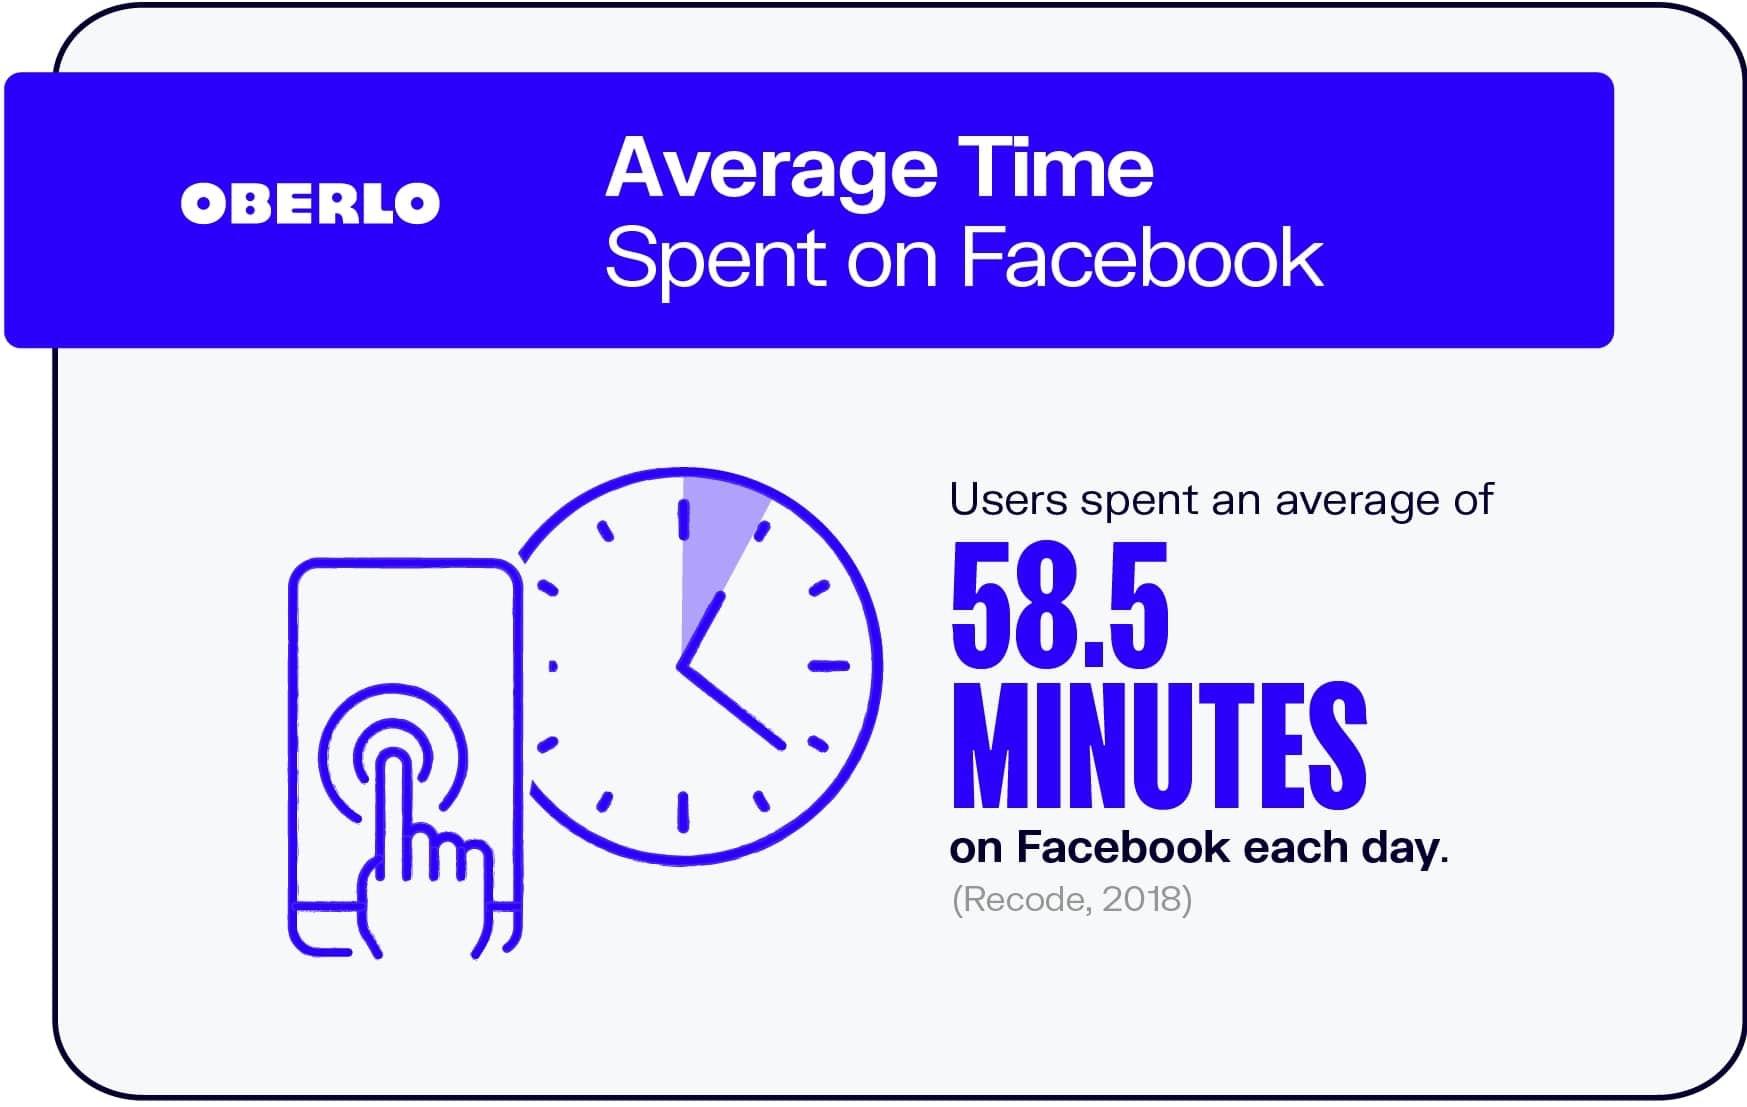 Average Time Spent on Facebook